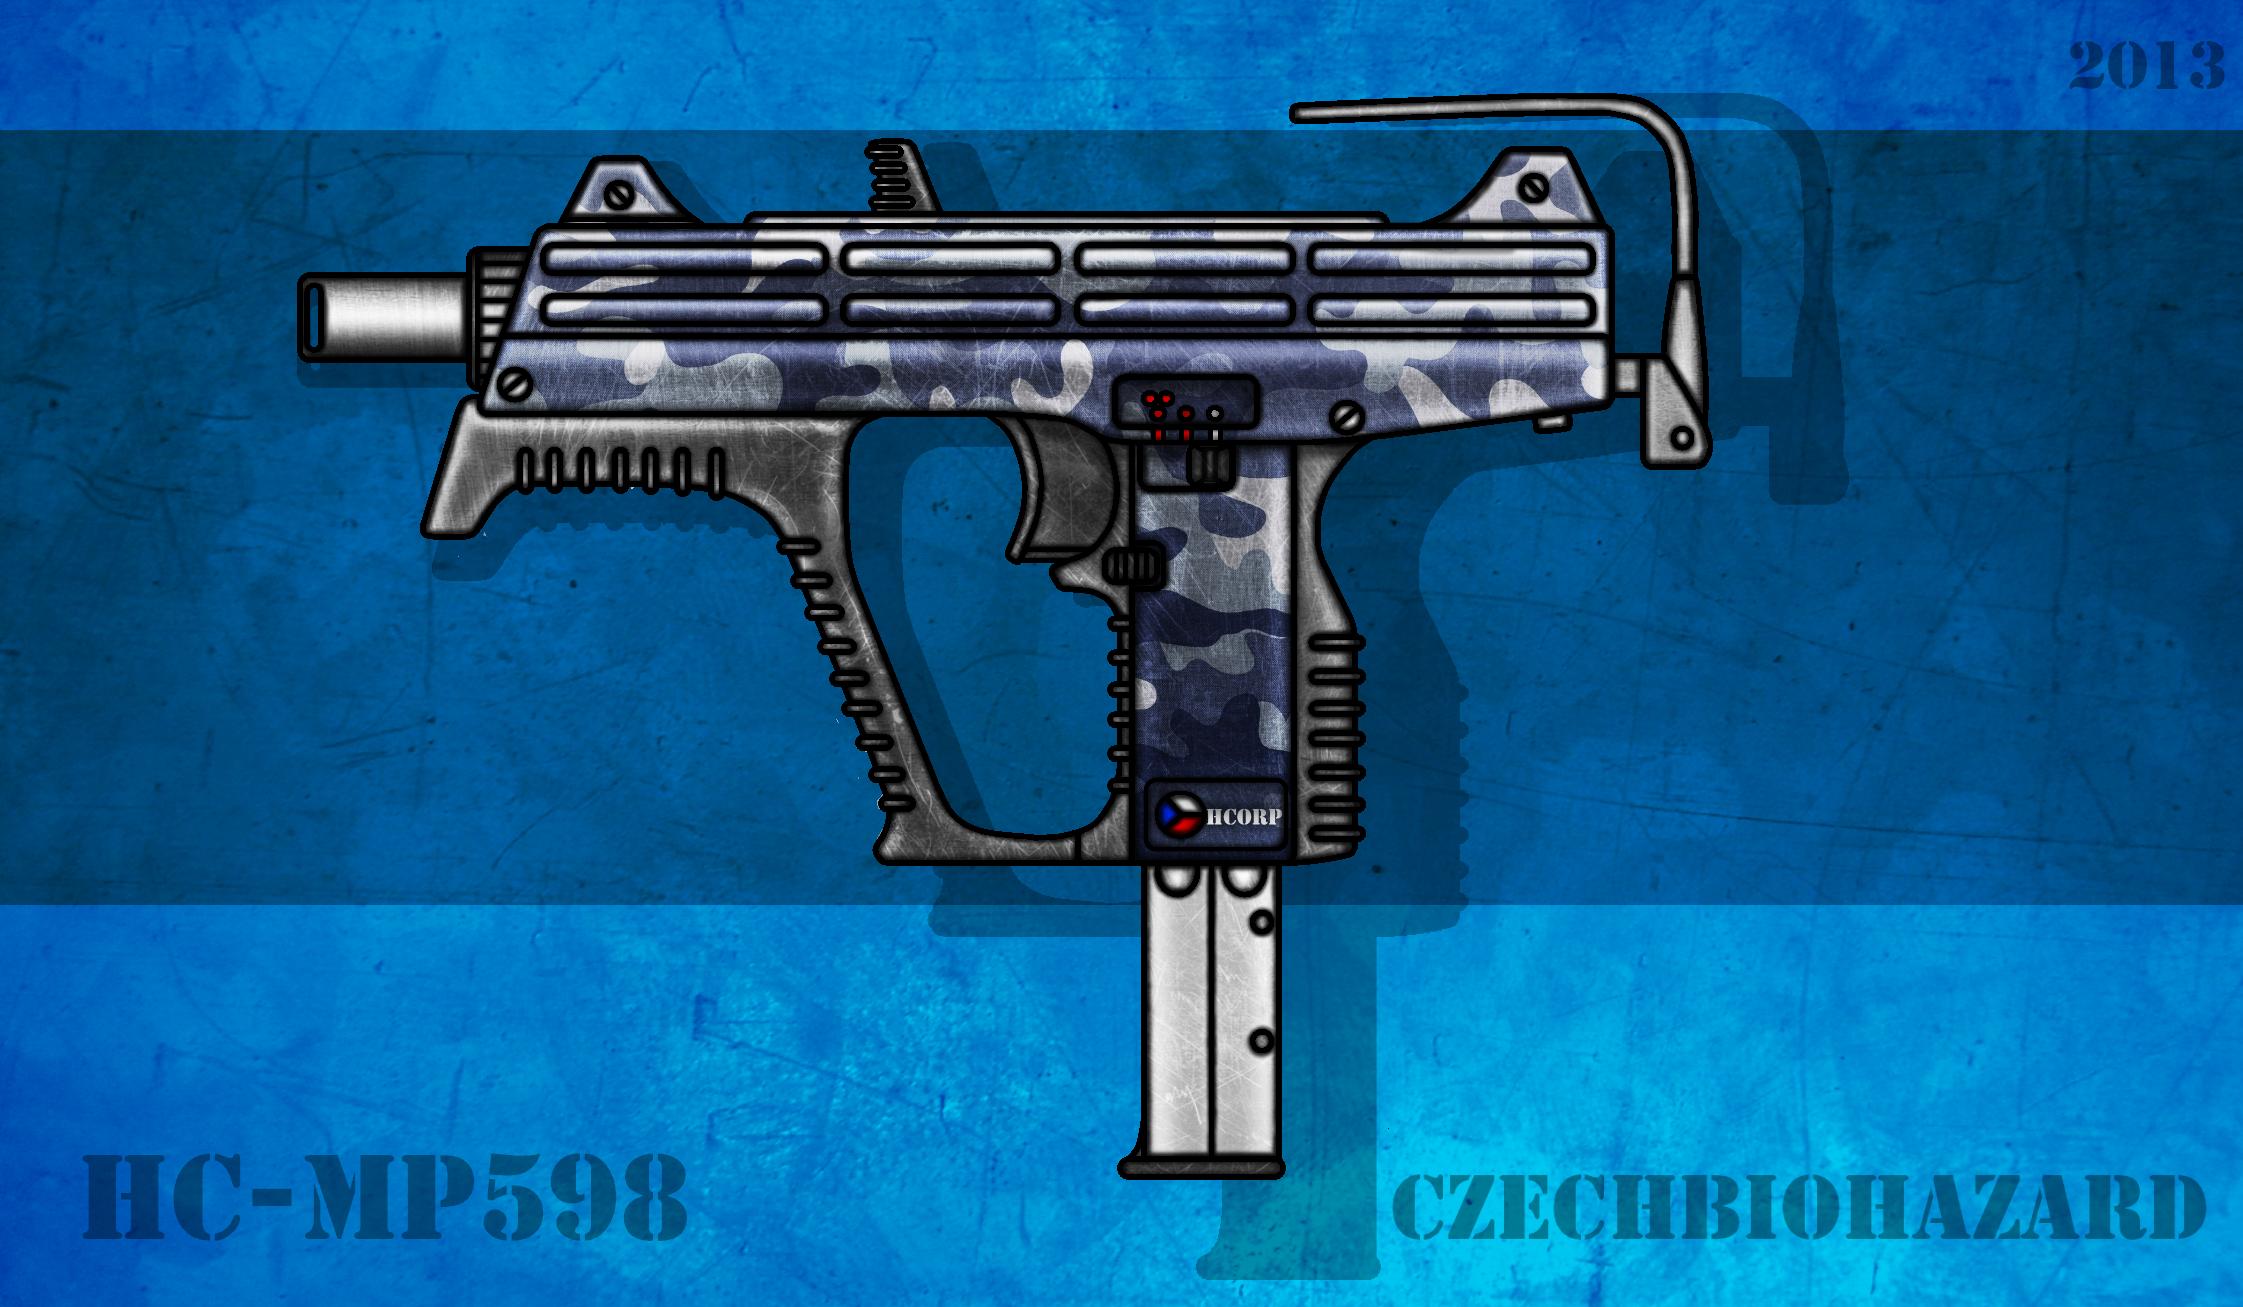 Fictional Firearm: HC-MP598 Submachine Gun by CzechBiohazard